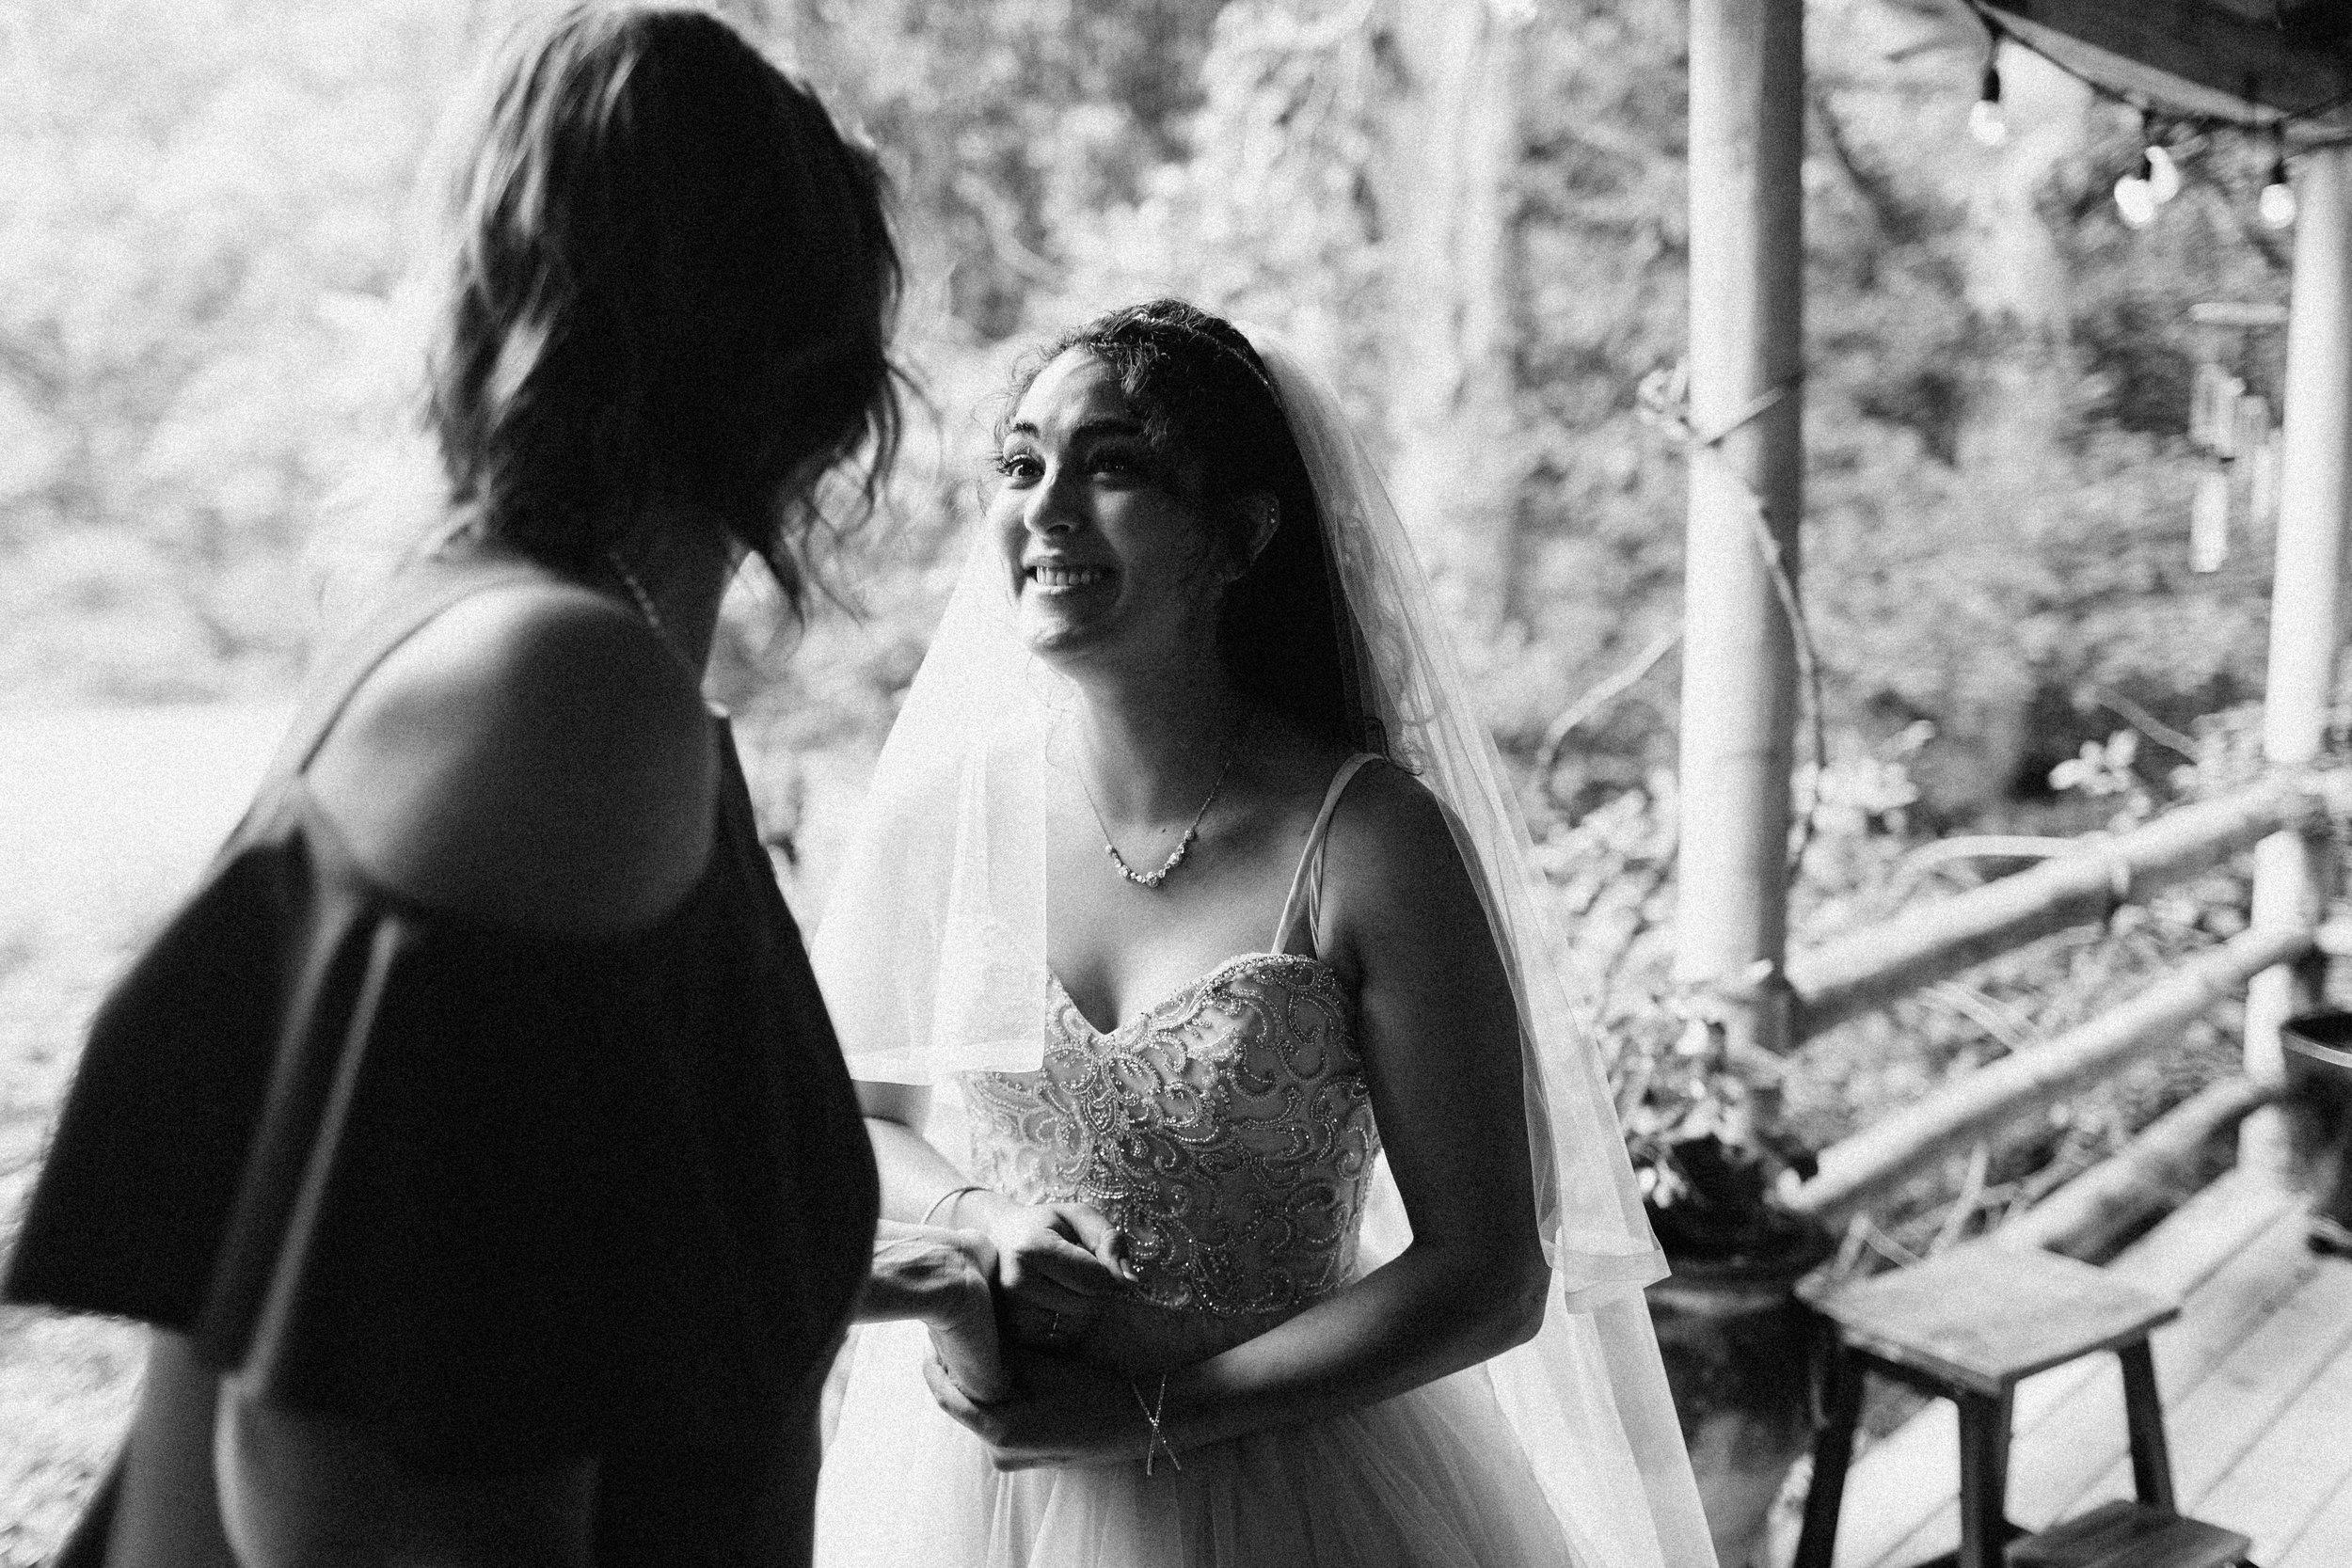 neverland_farms_atlanta_wedding_photographer_documentary_river_west_1388.jpg